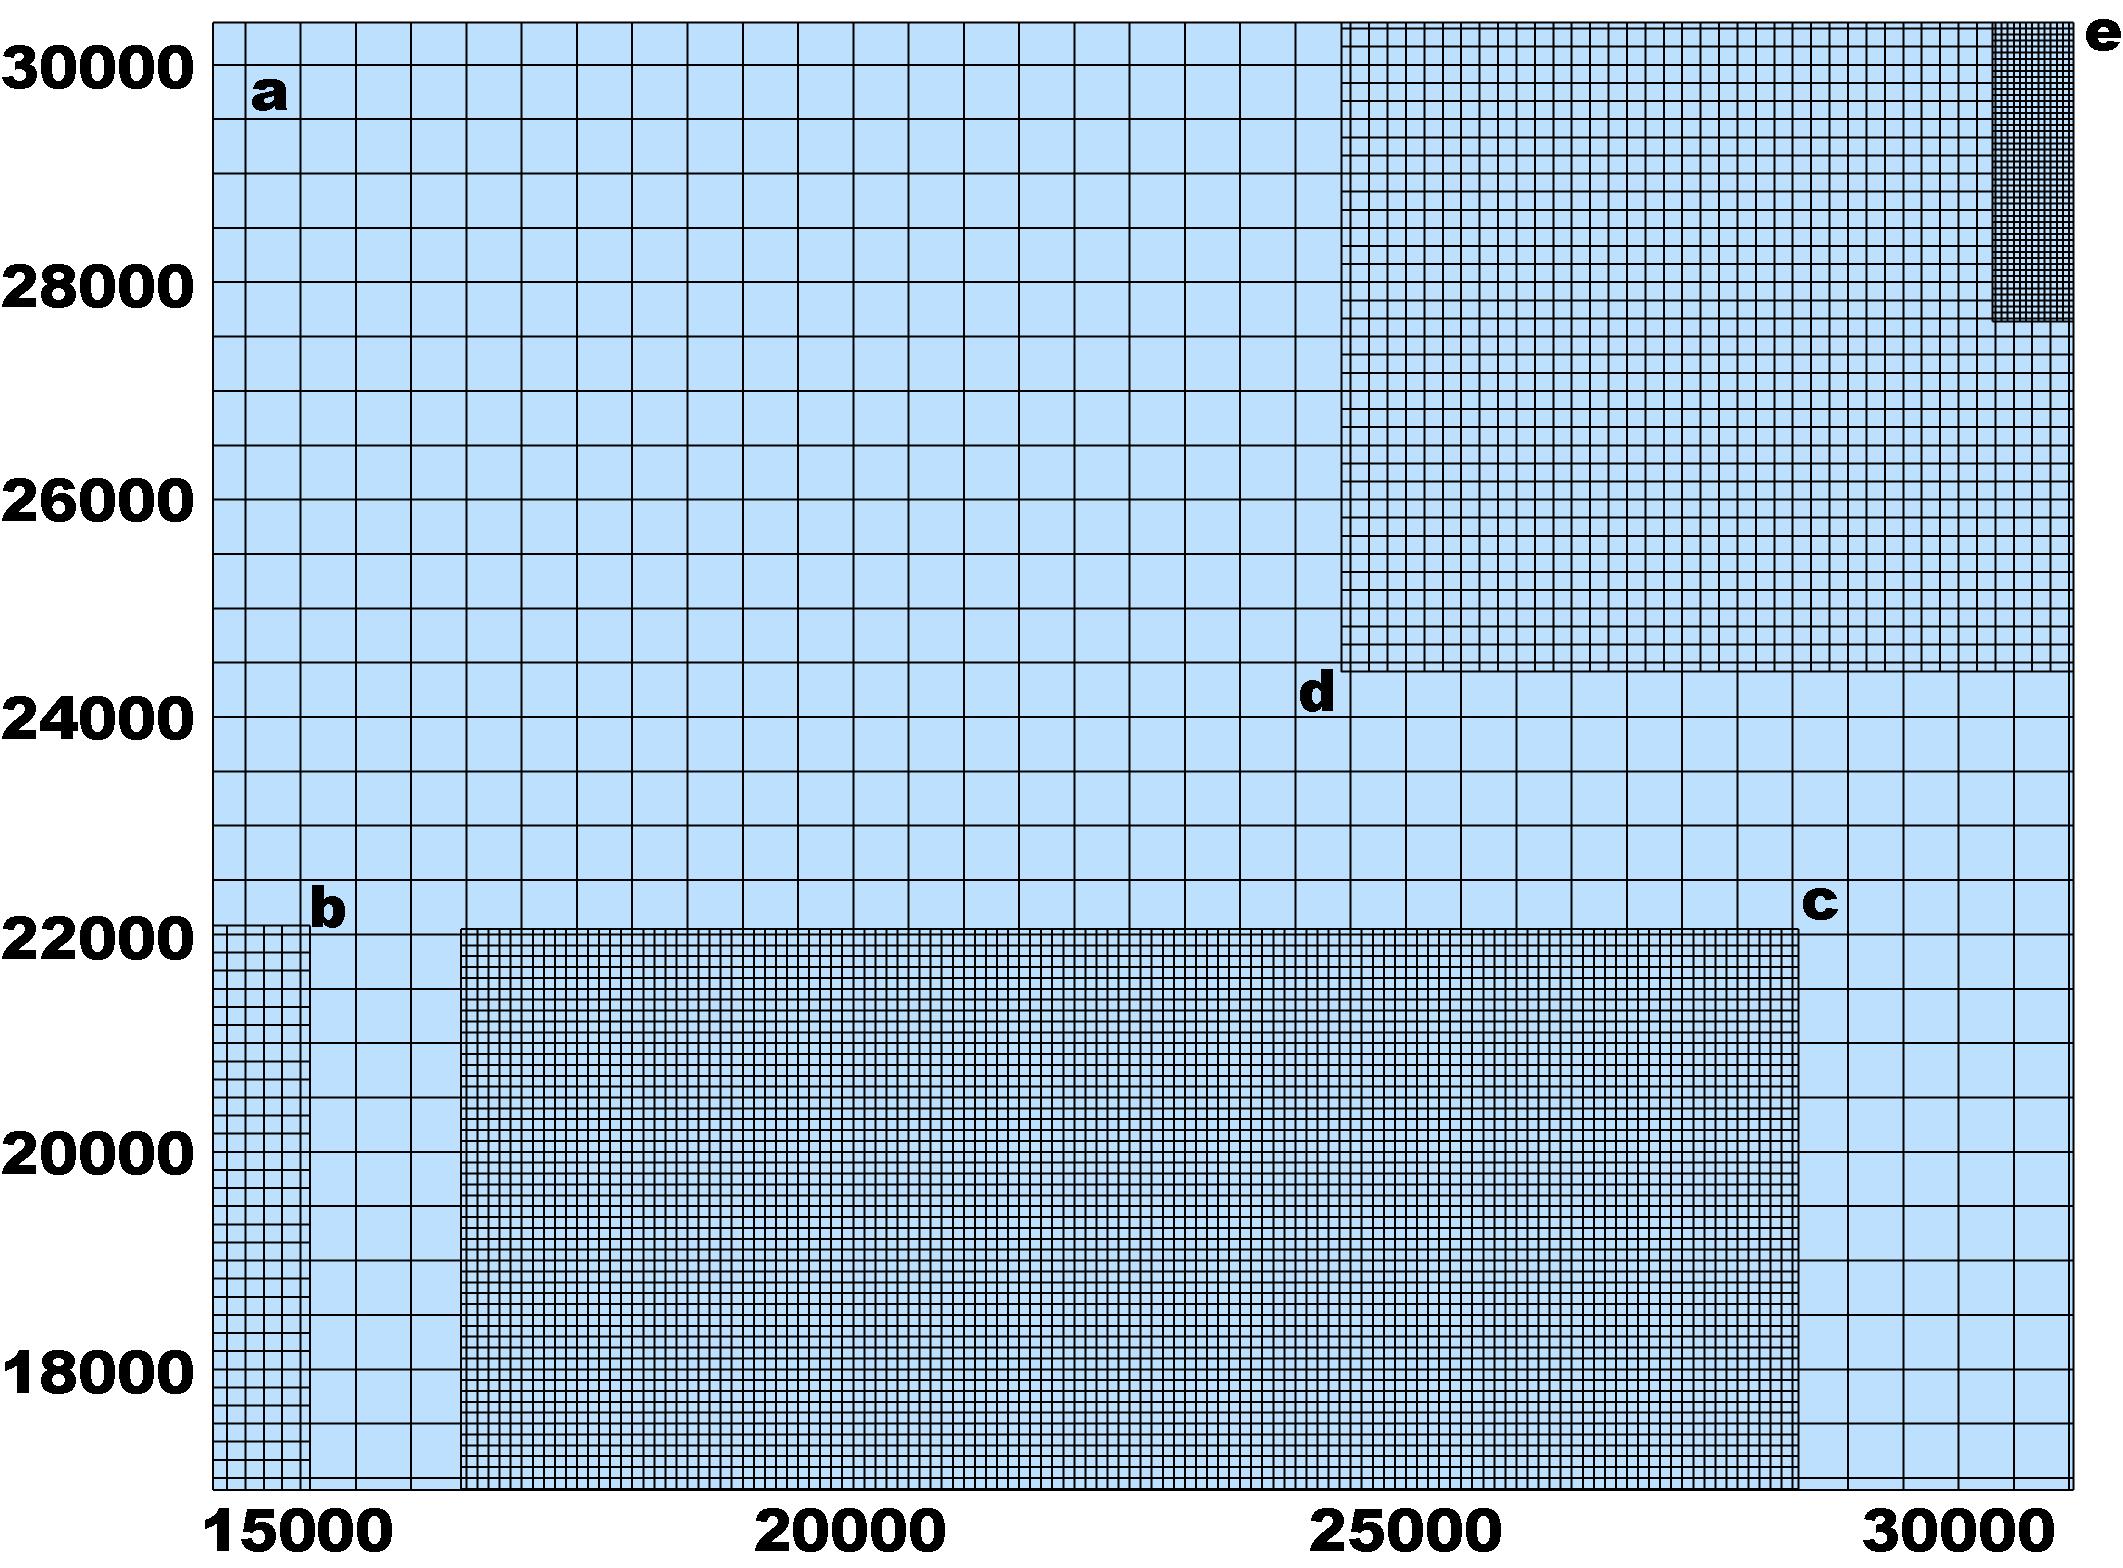 https://www.myroms.org/wiki/images/f/ff/lake_jersey_grids_mesh_zoom.png